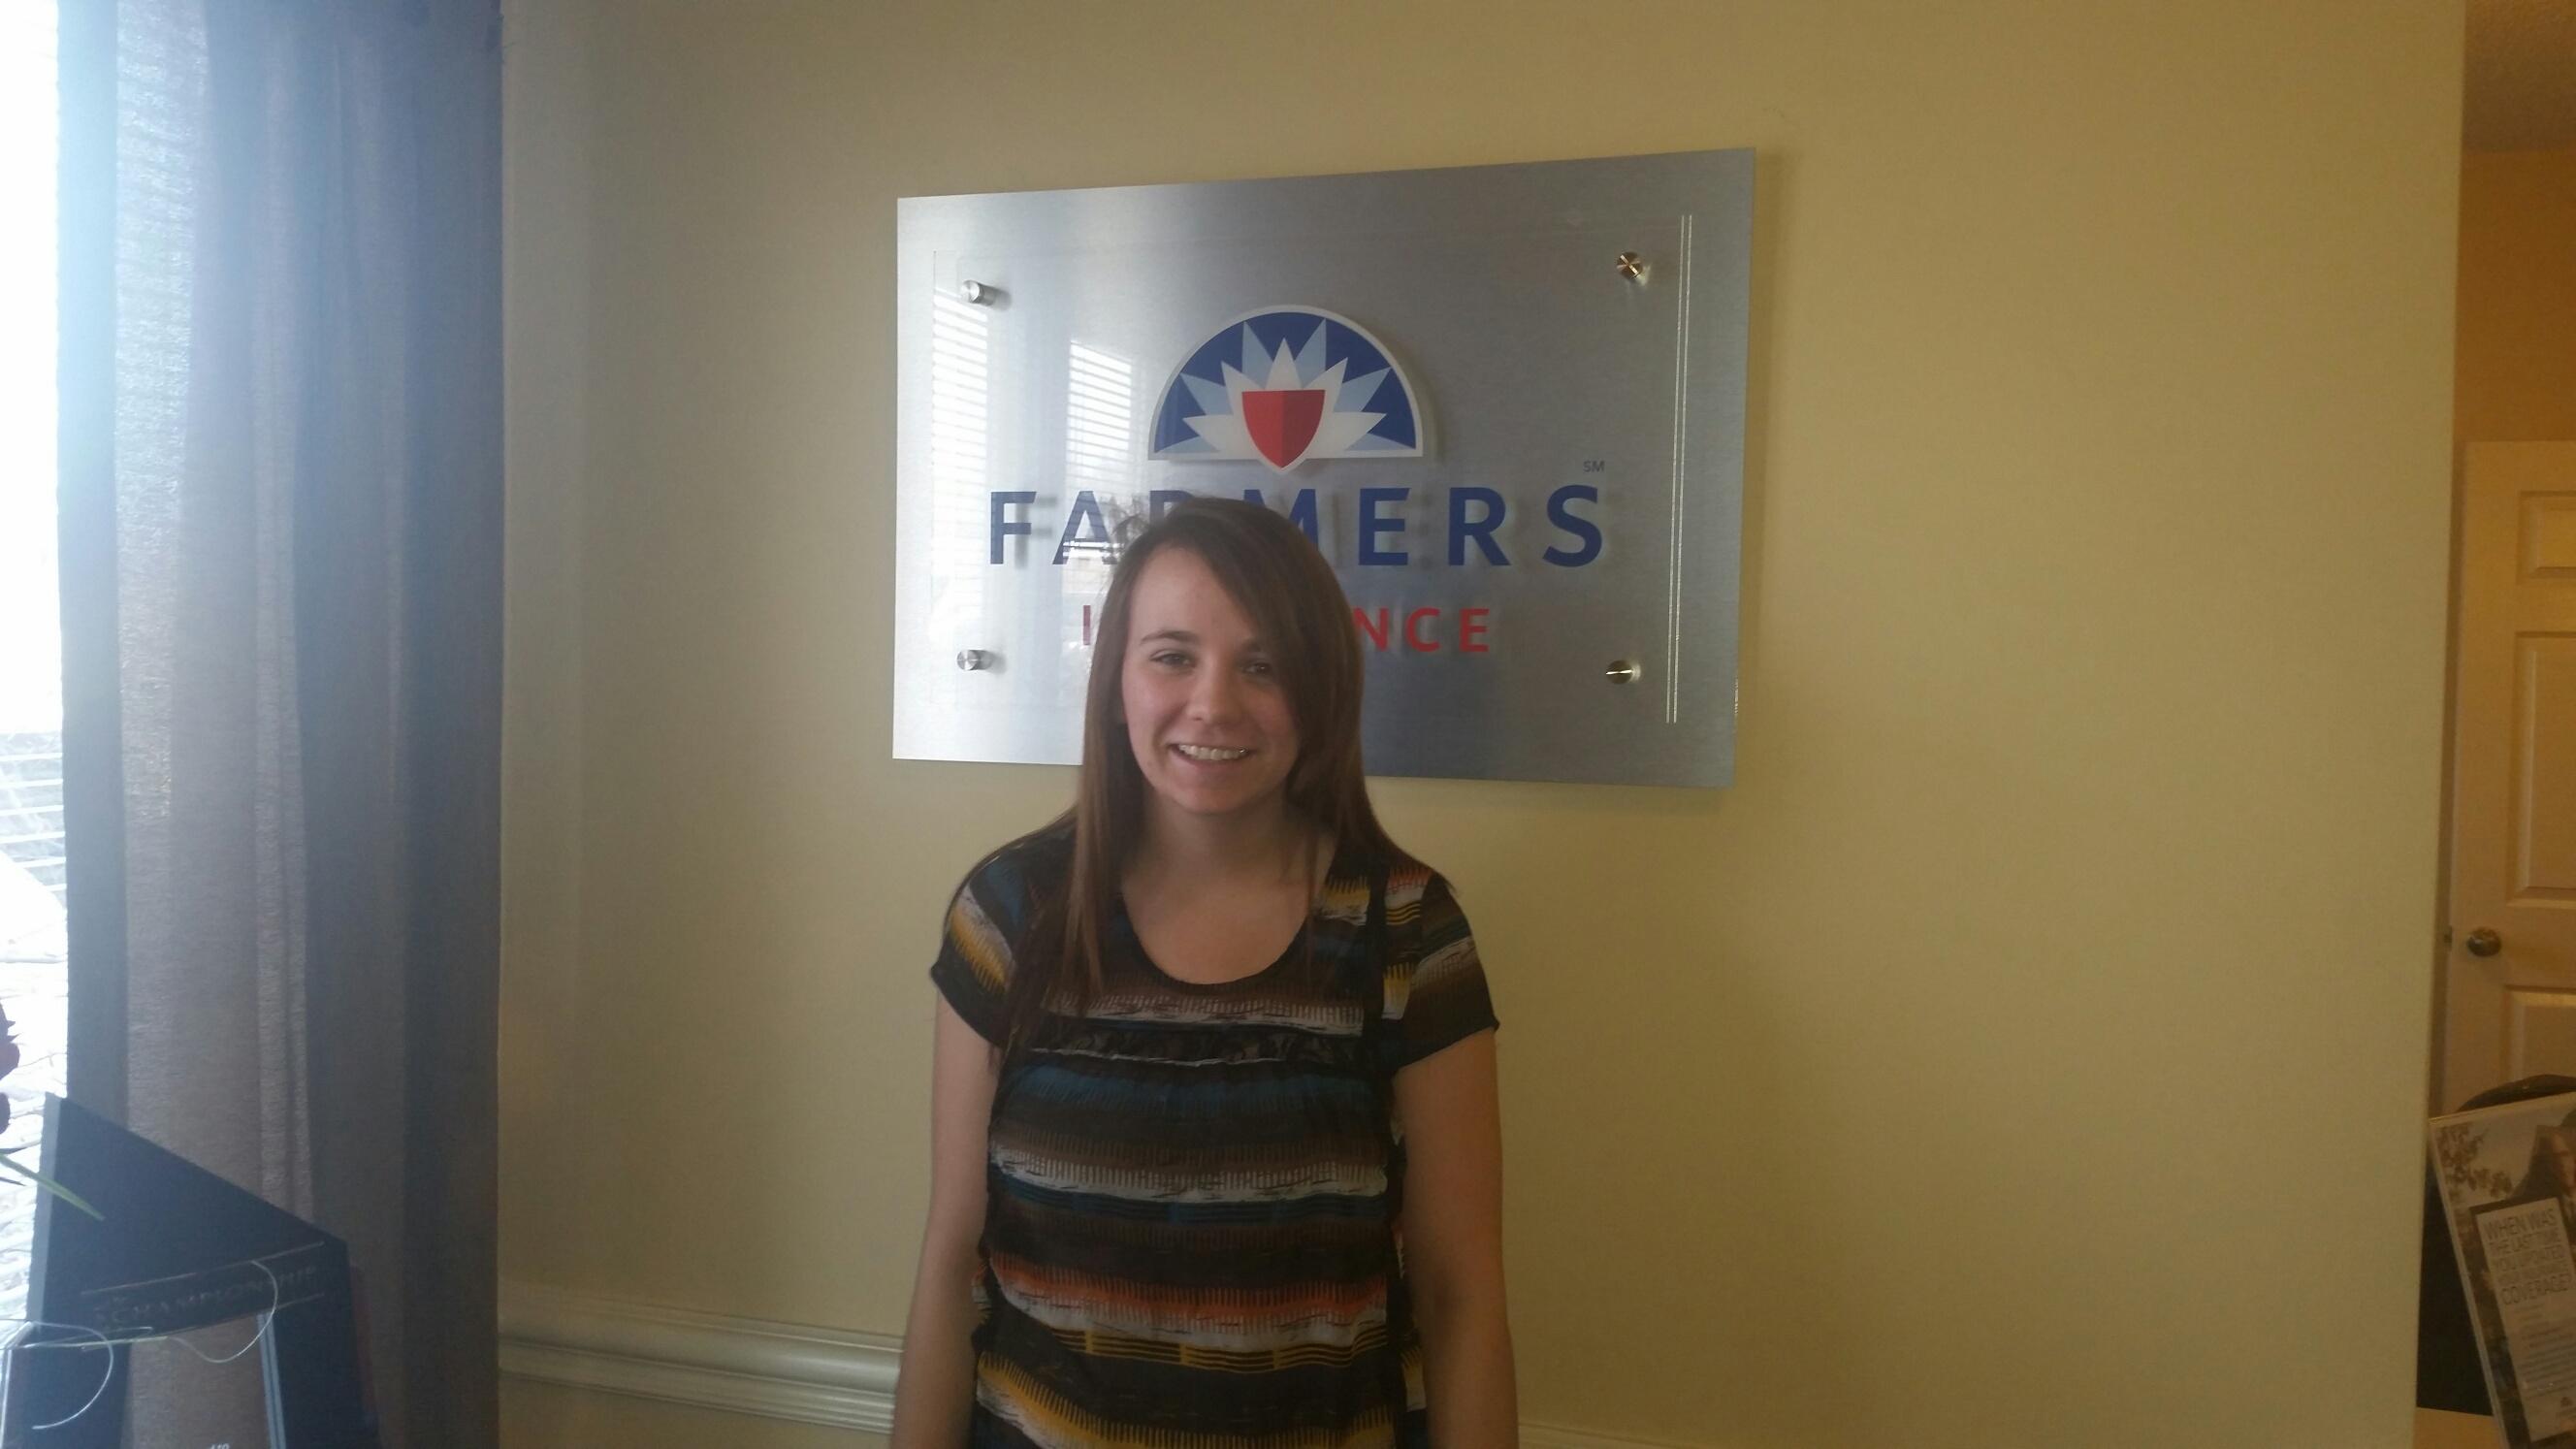 Farmers Insurance - Deborah York image 4